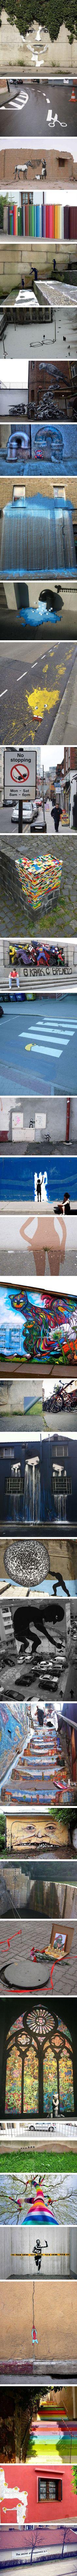 <3 Street art: